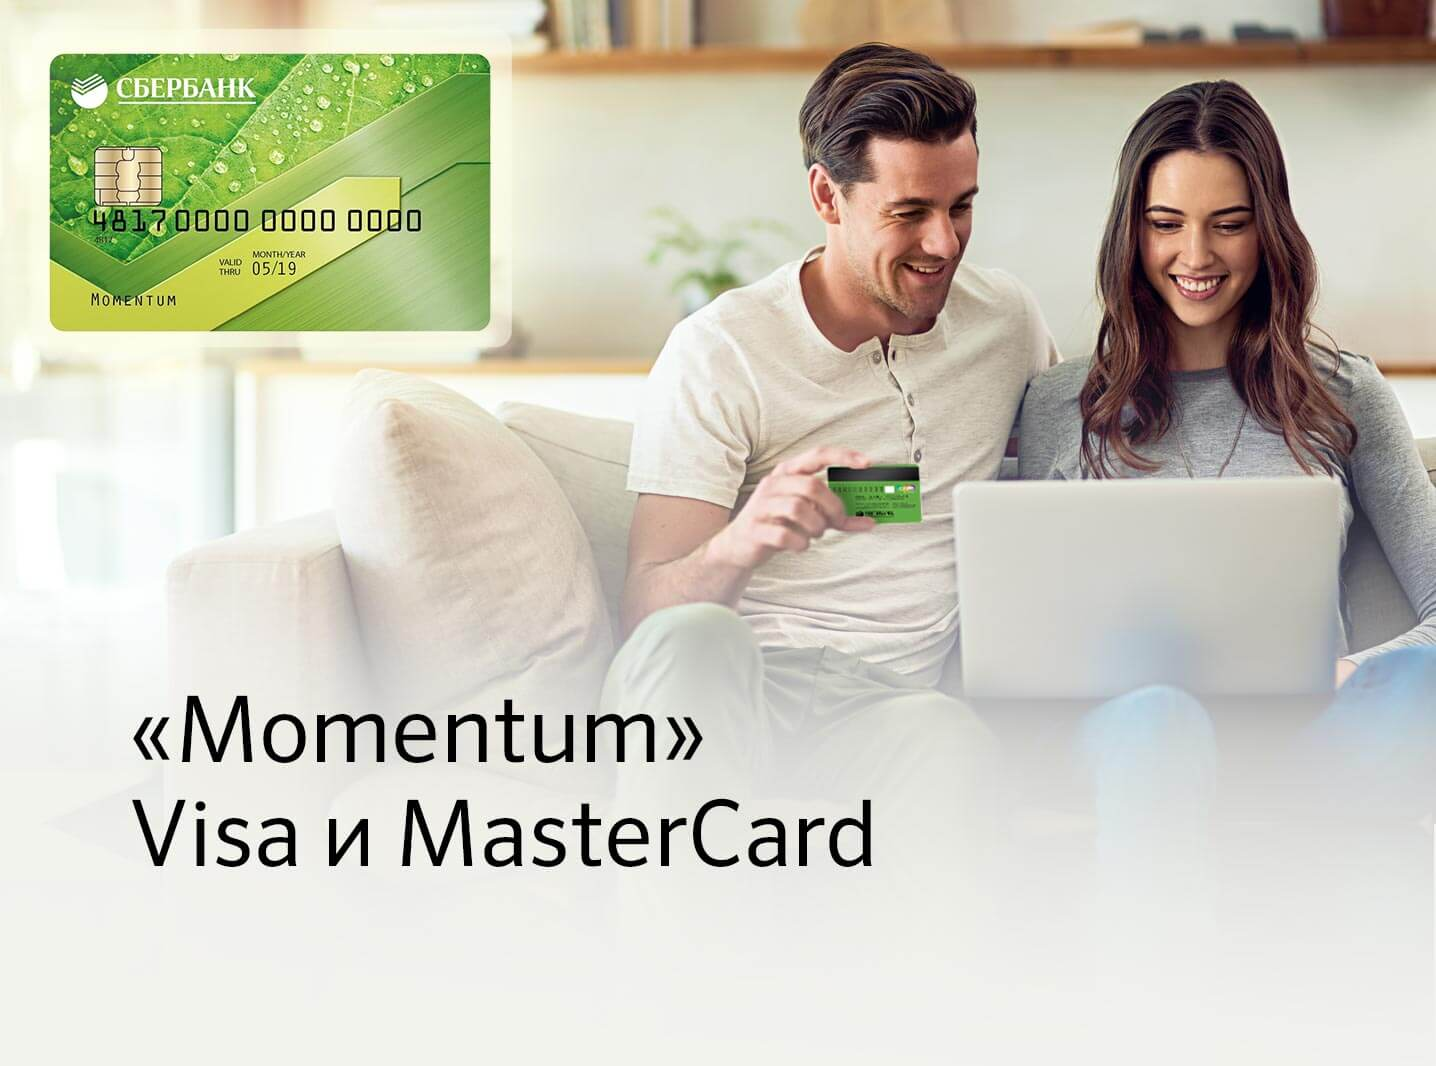 Сбербанк — кредитная карта Momentum, условия